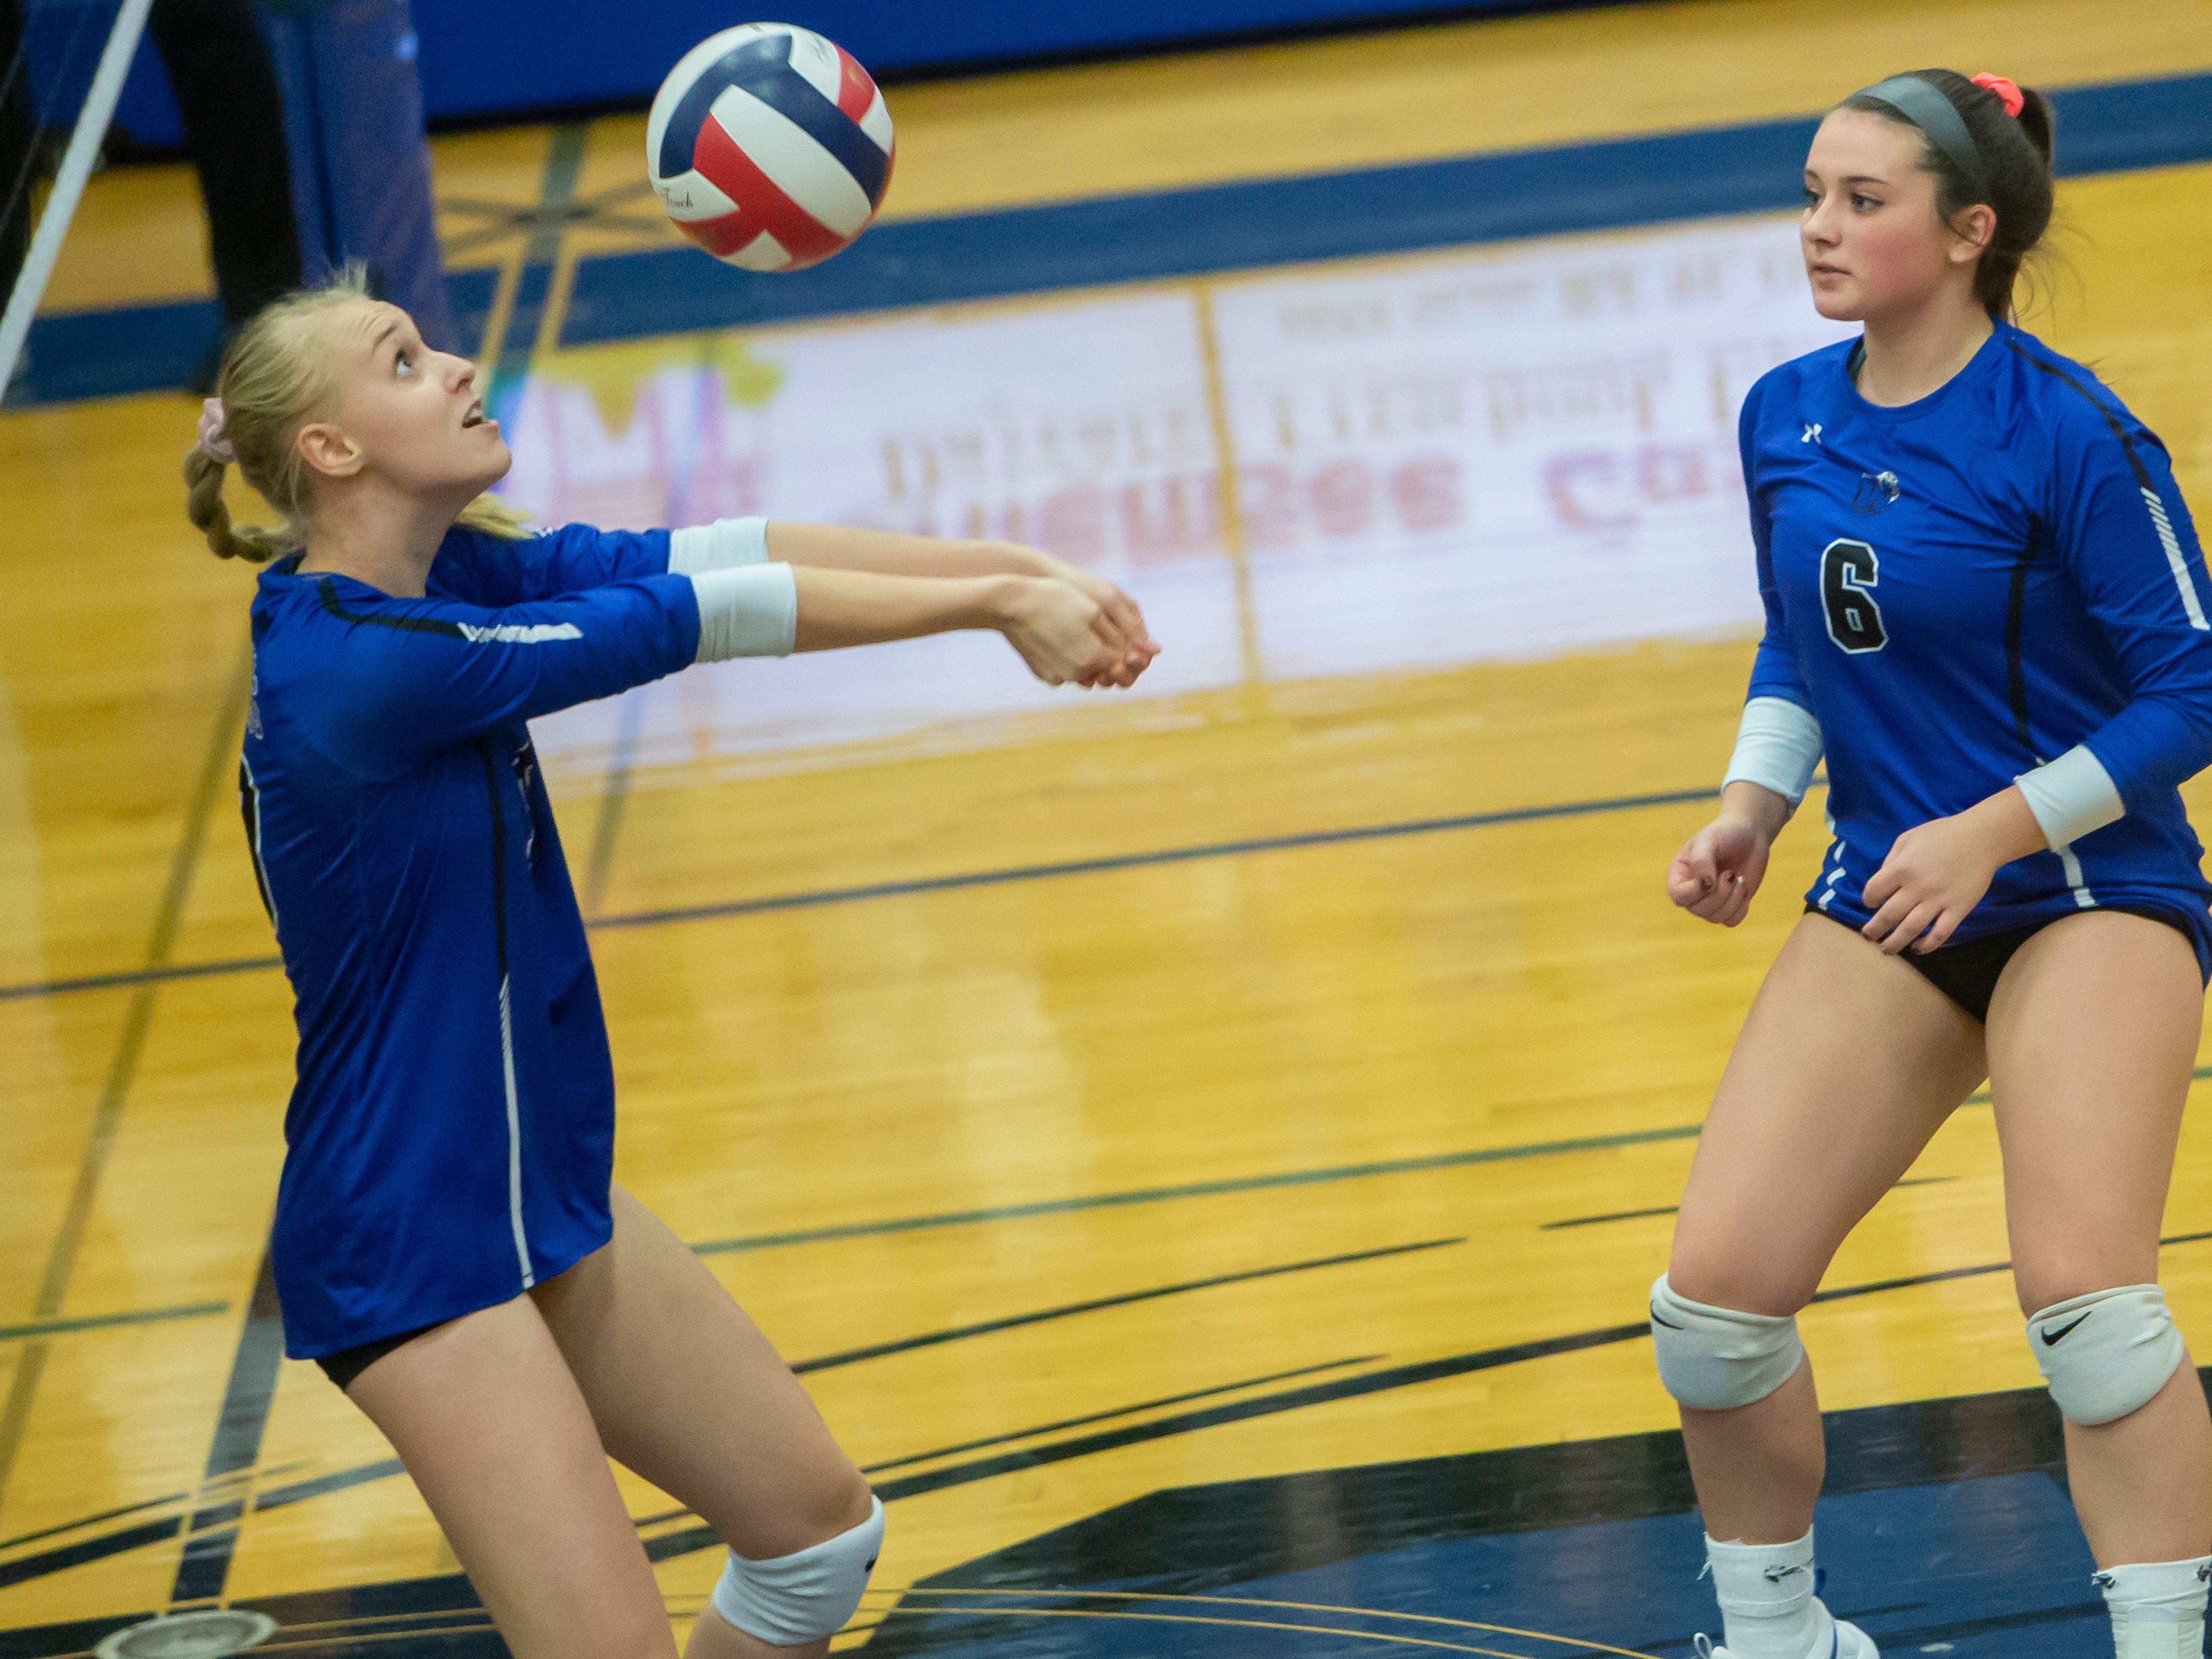 Oshkosh West's Natalie Johnknecht sets up a net shot playing at Oshkosh West High School on Thursday, October 11, 2018.